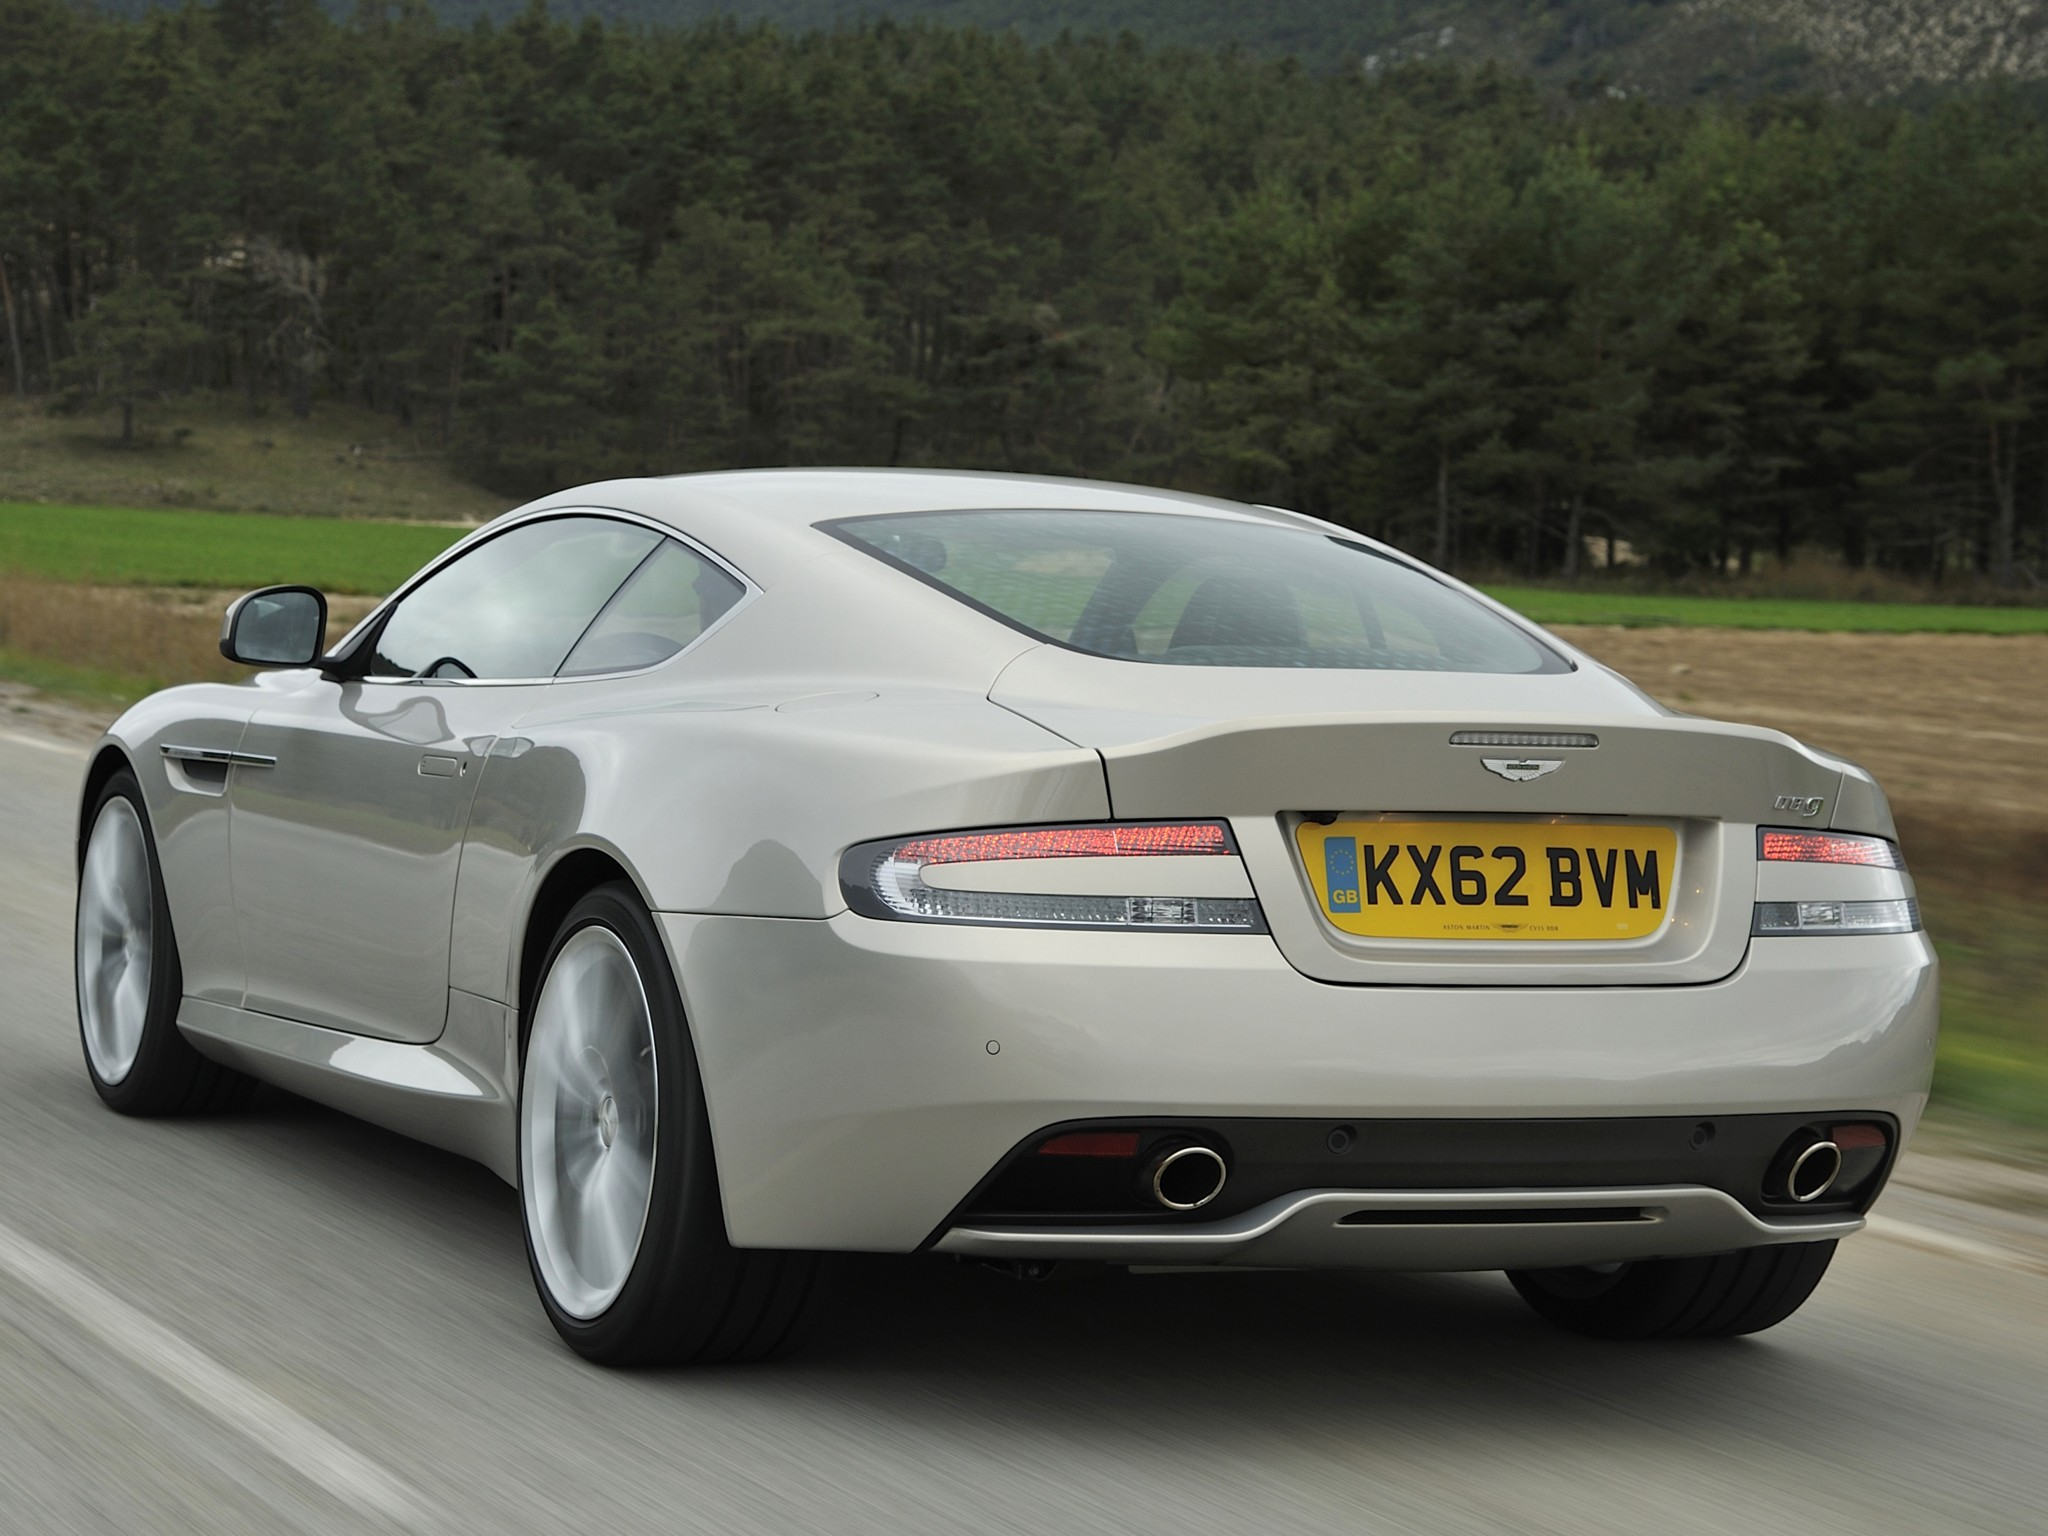 Aston Martin DB9 Wallpapers Cool Cars Wallpaper 2048x1536